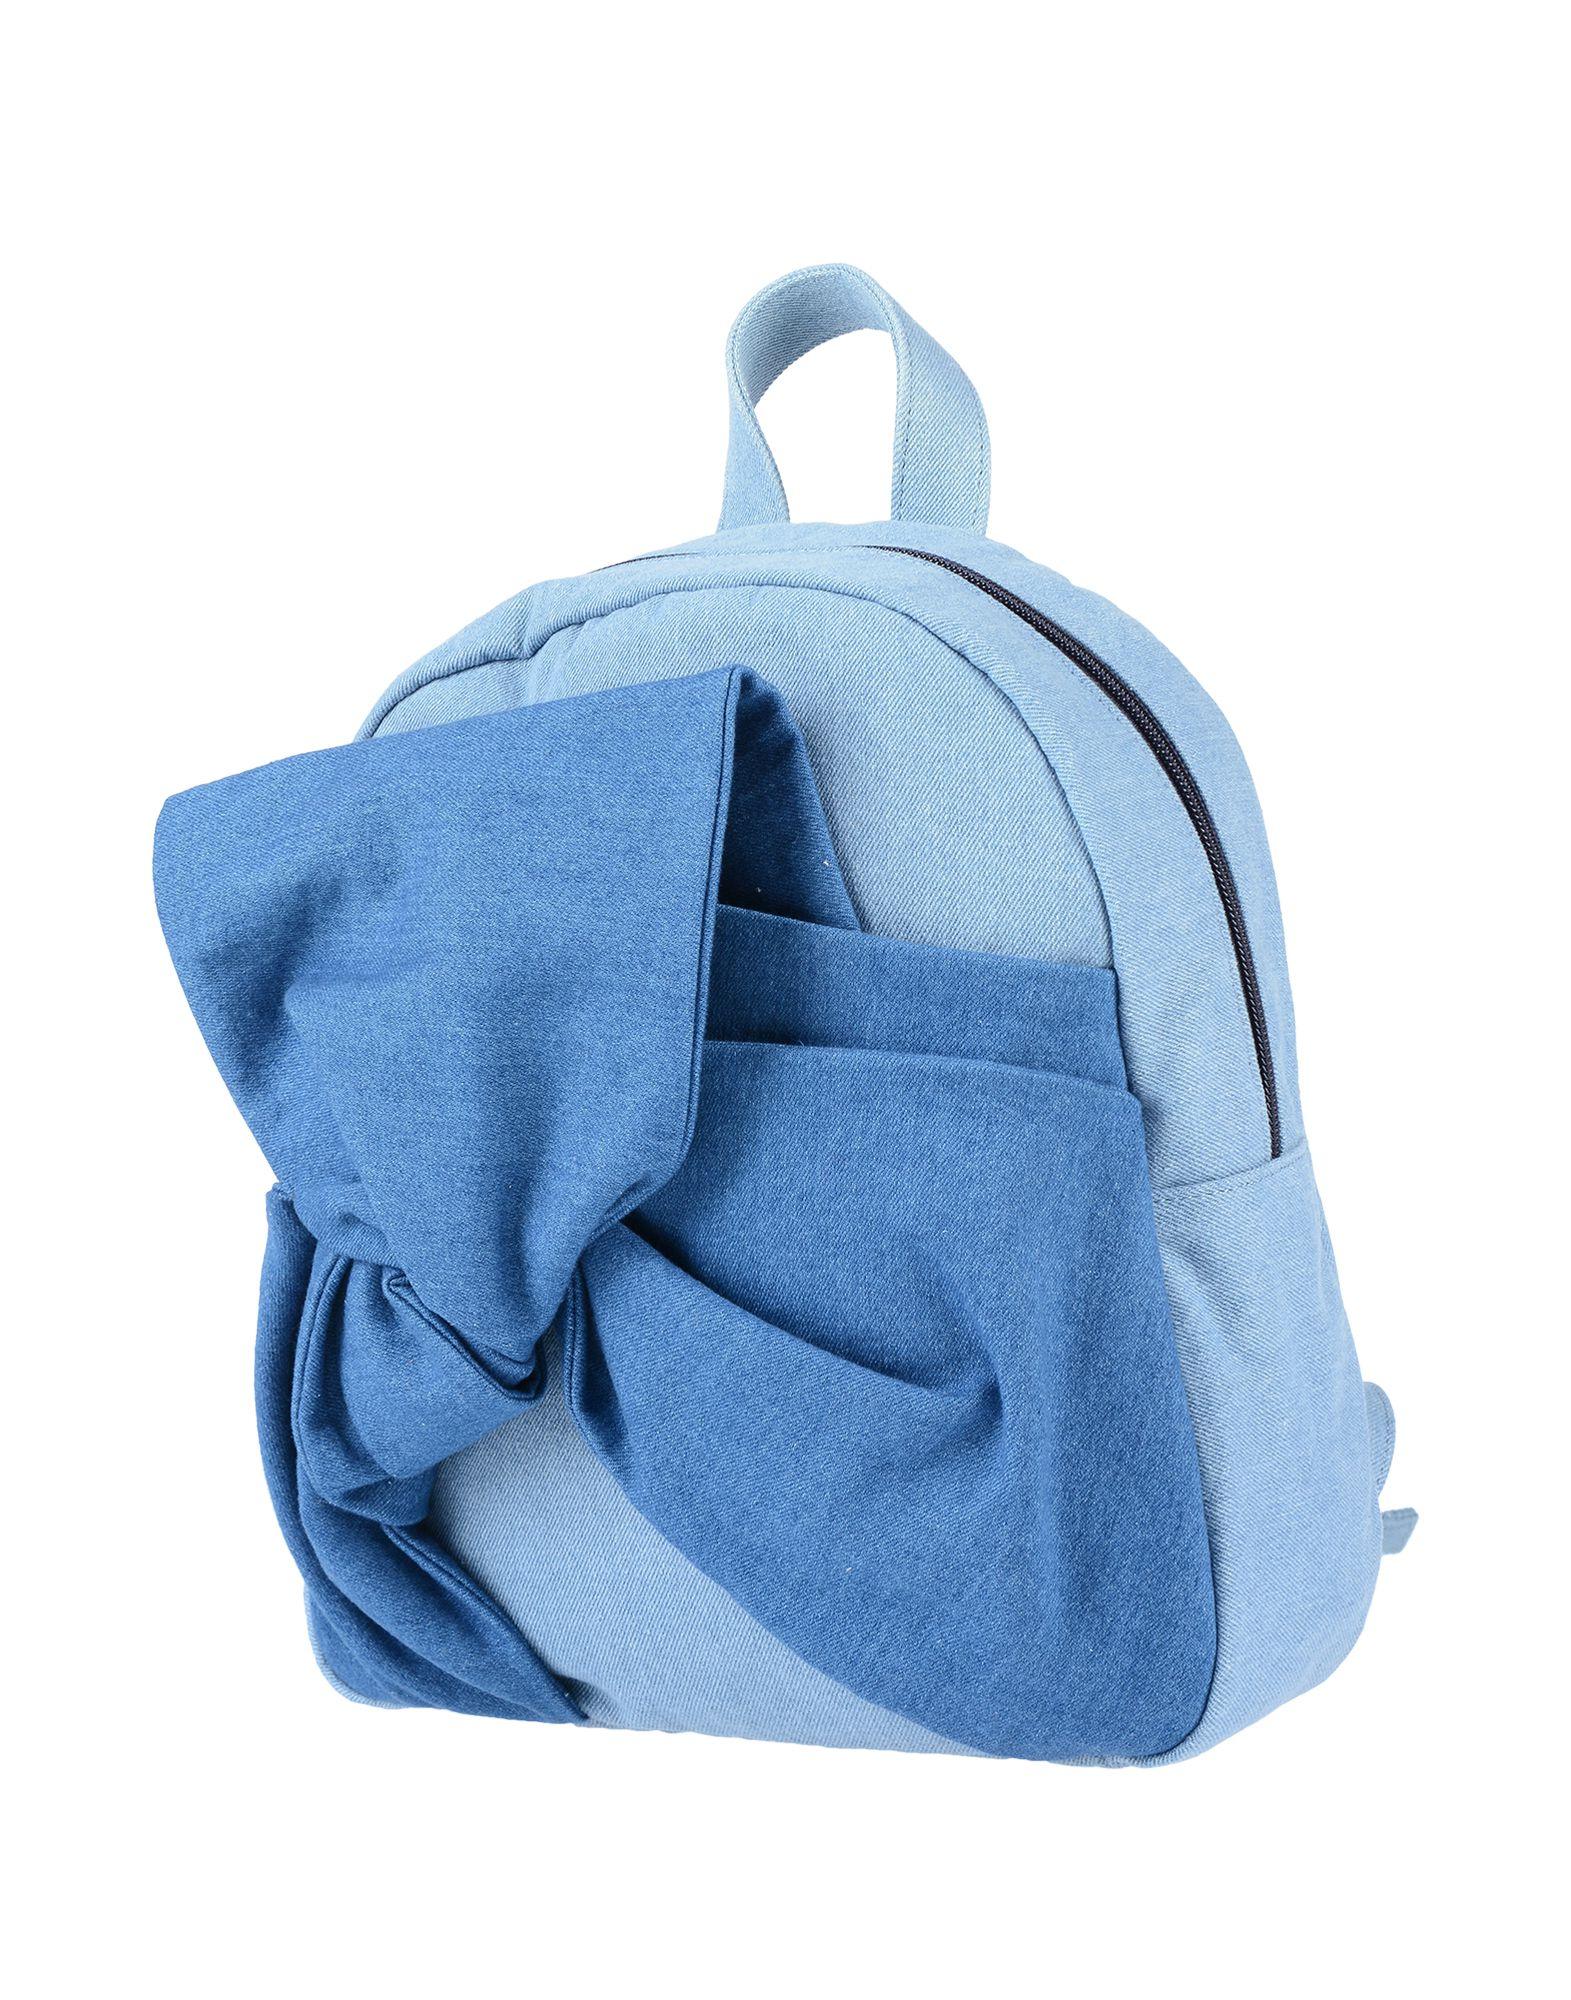 STELLA McCARTNEY KIDS Рюкзаки и сумки на пояс adidas by stella mccartney рюкзаки и сумки на пояс